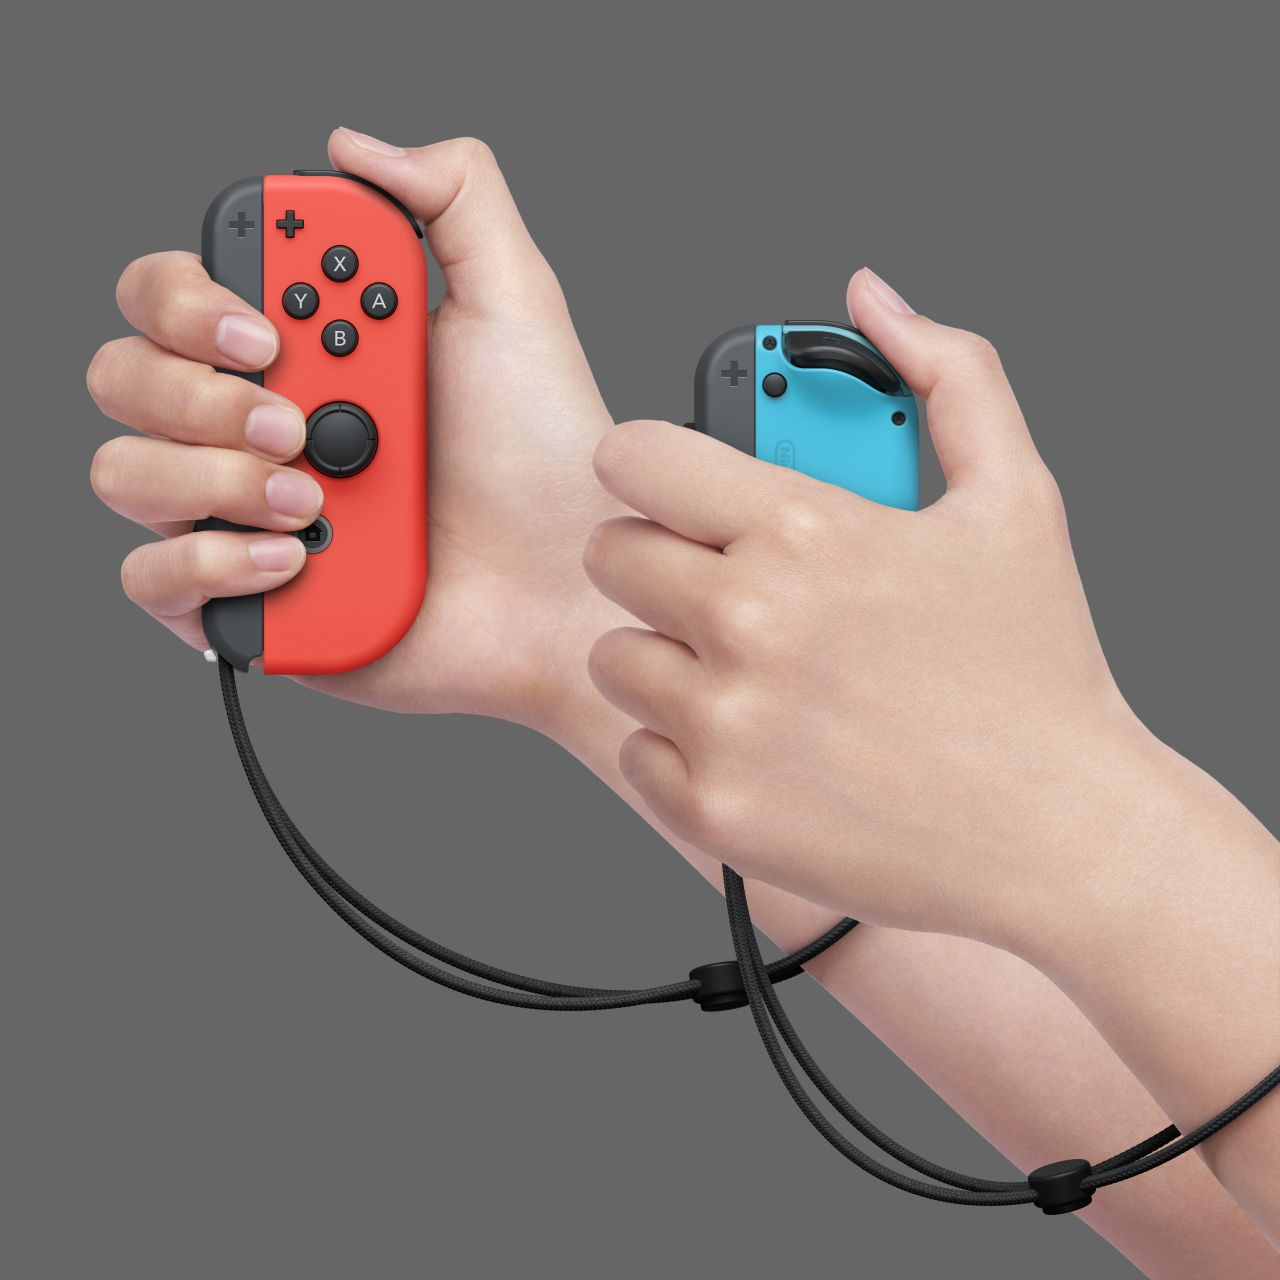 NintendoSwitch-ARMS-photo-03